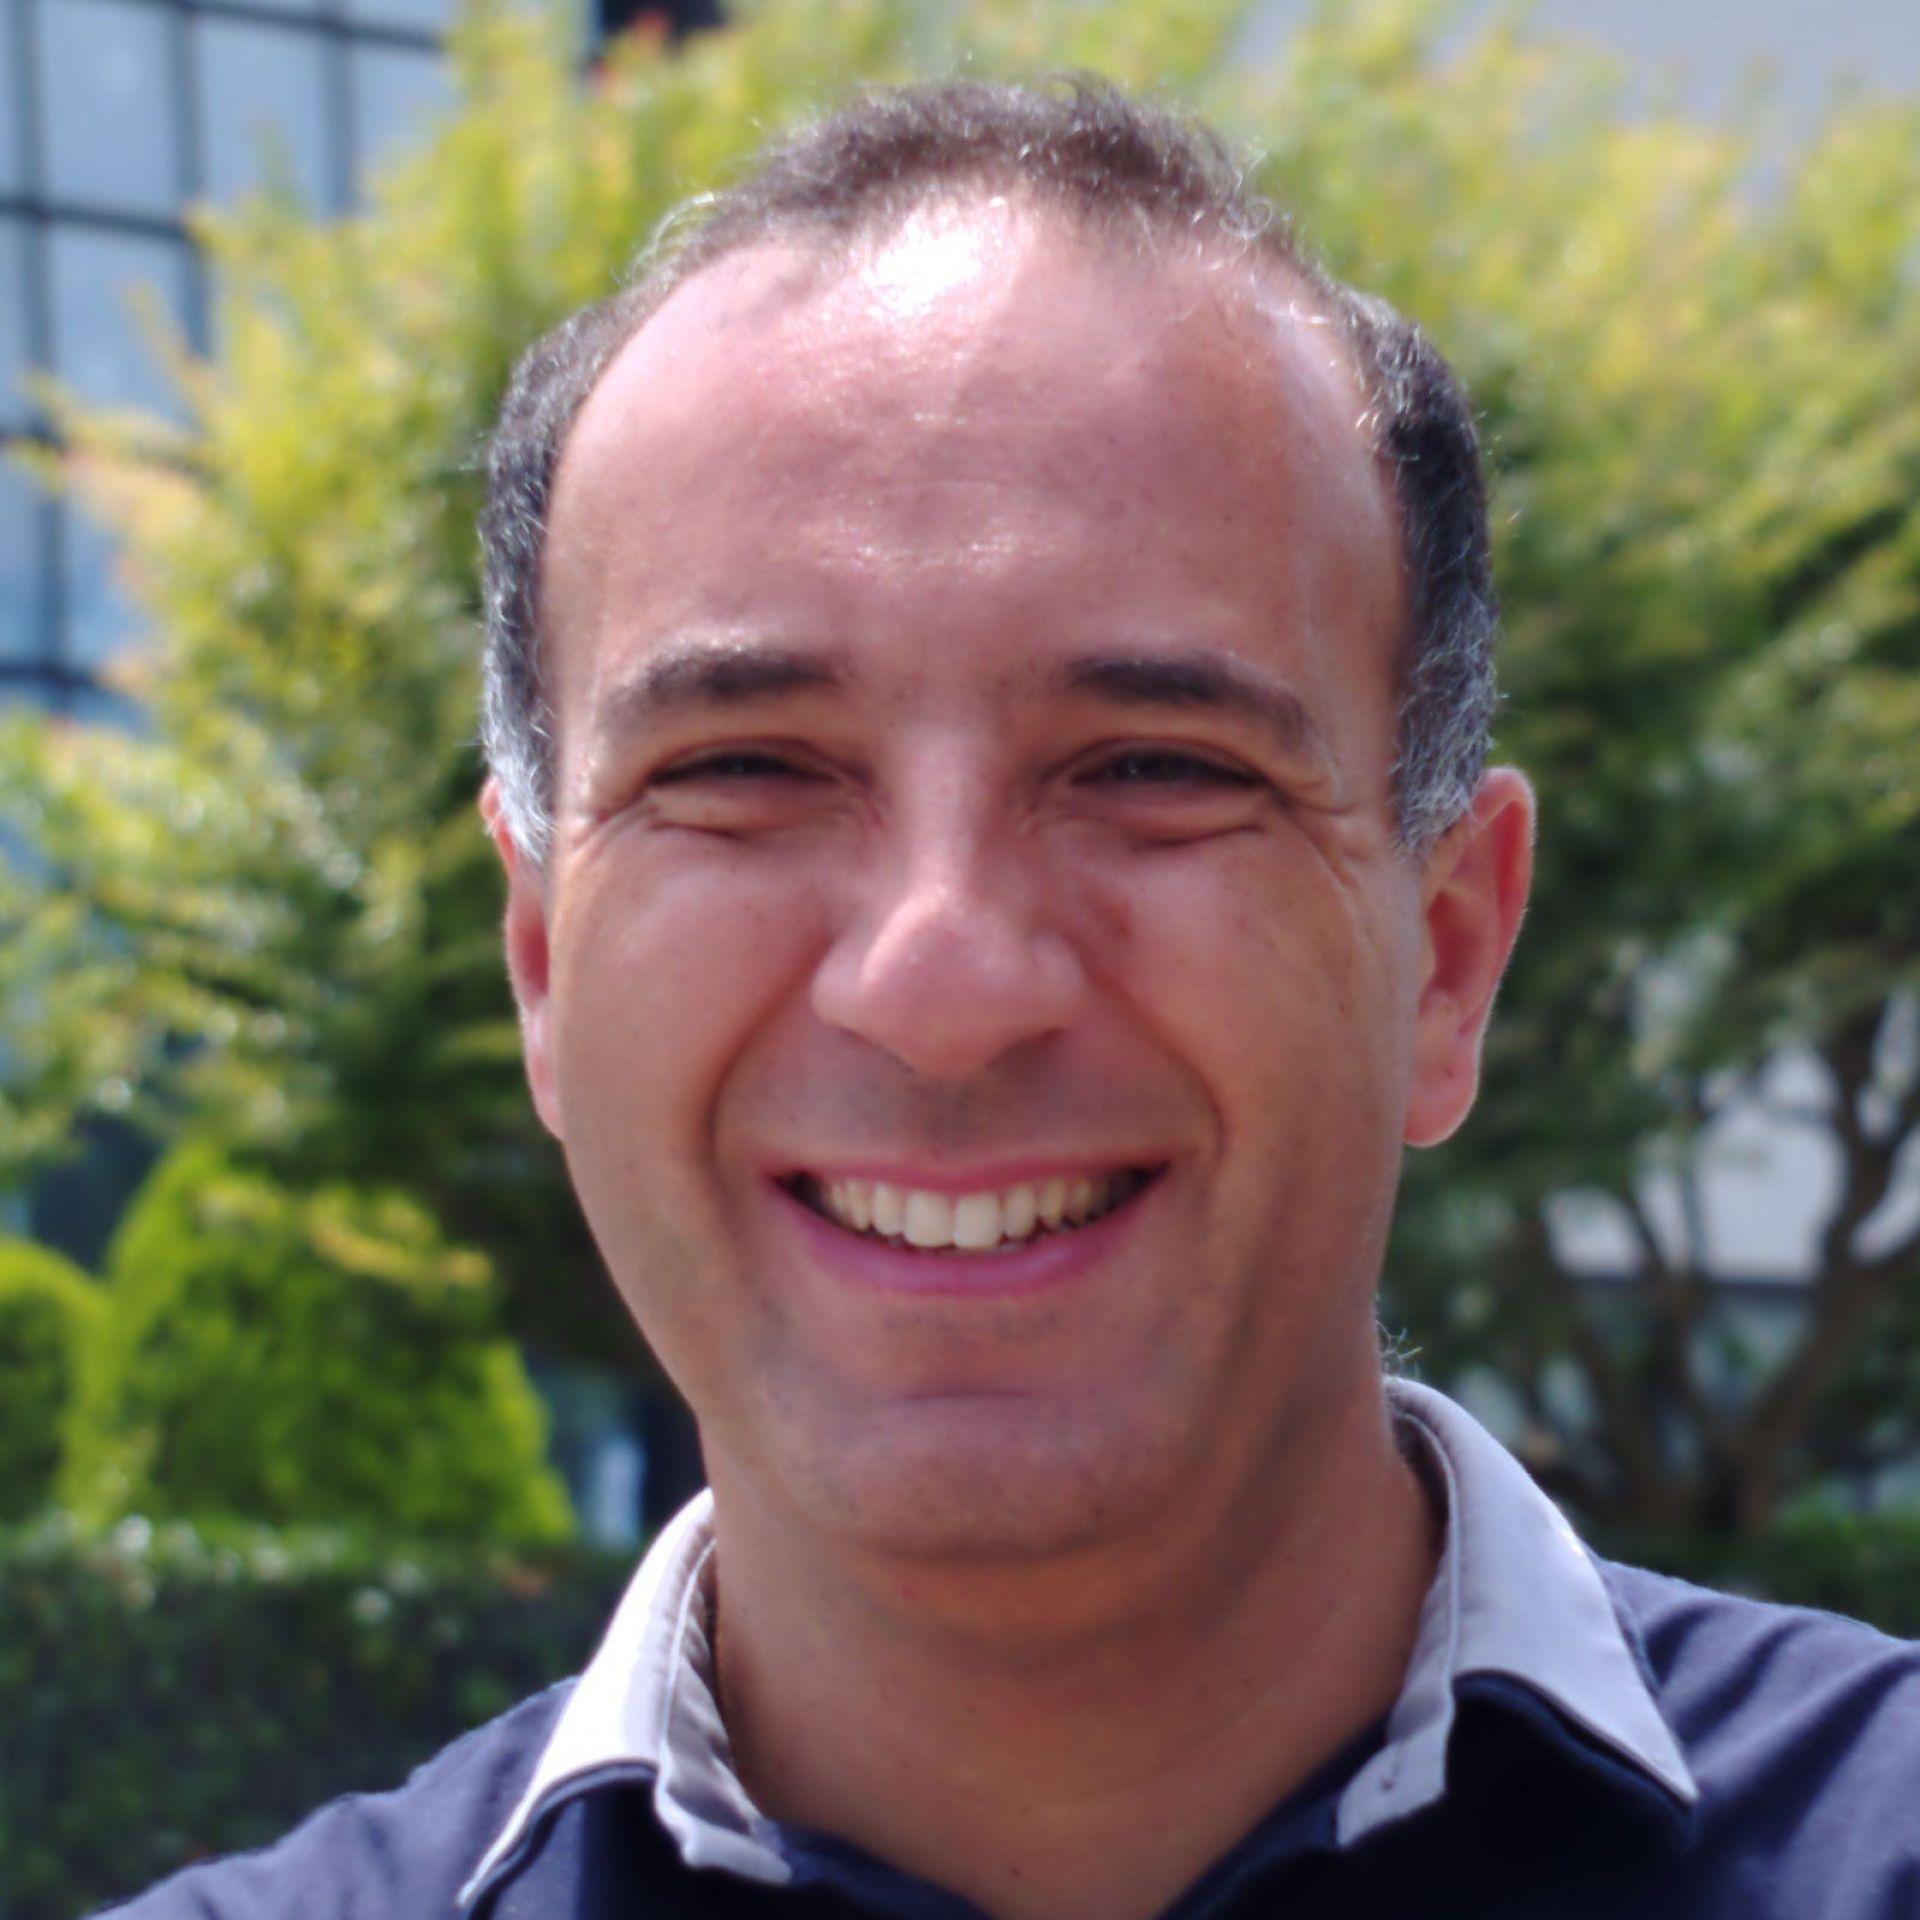 Fausto Spoto